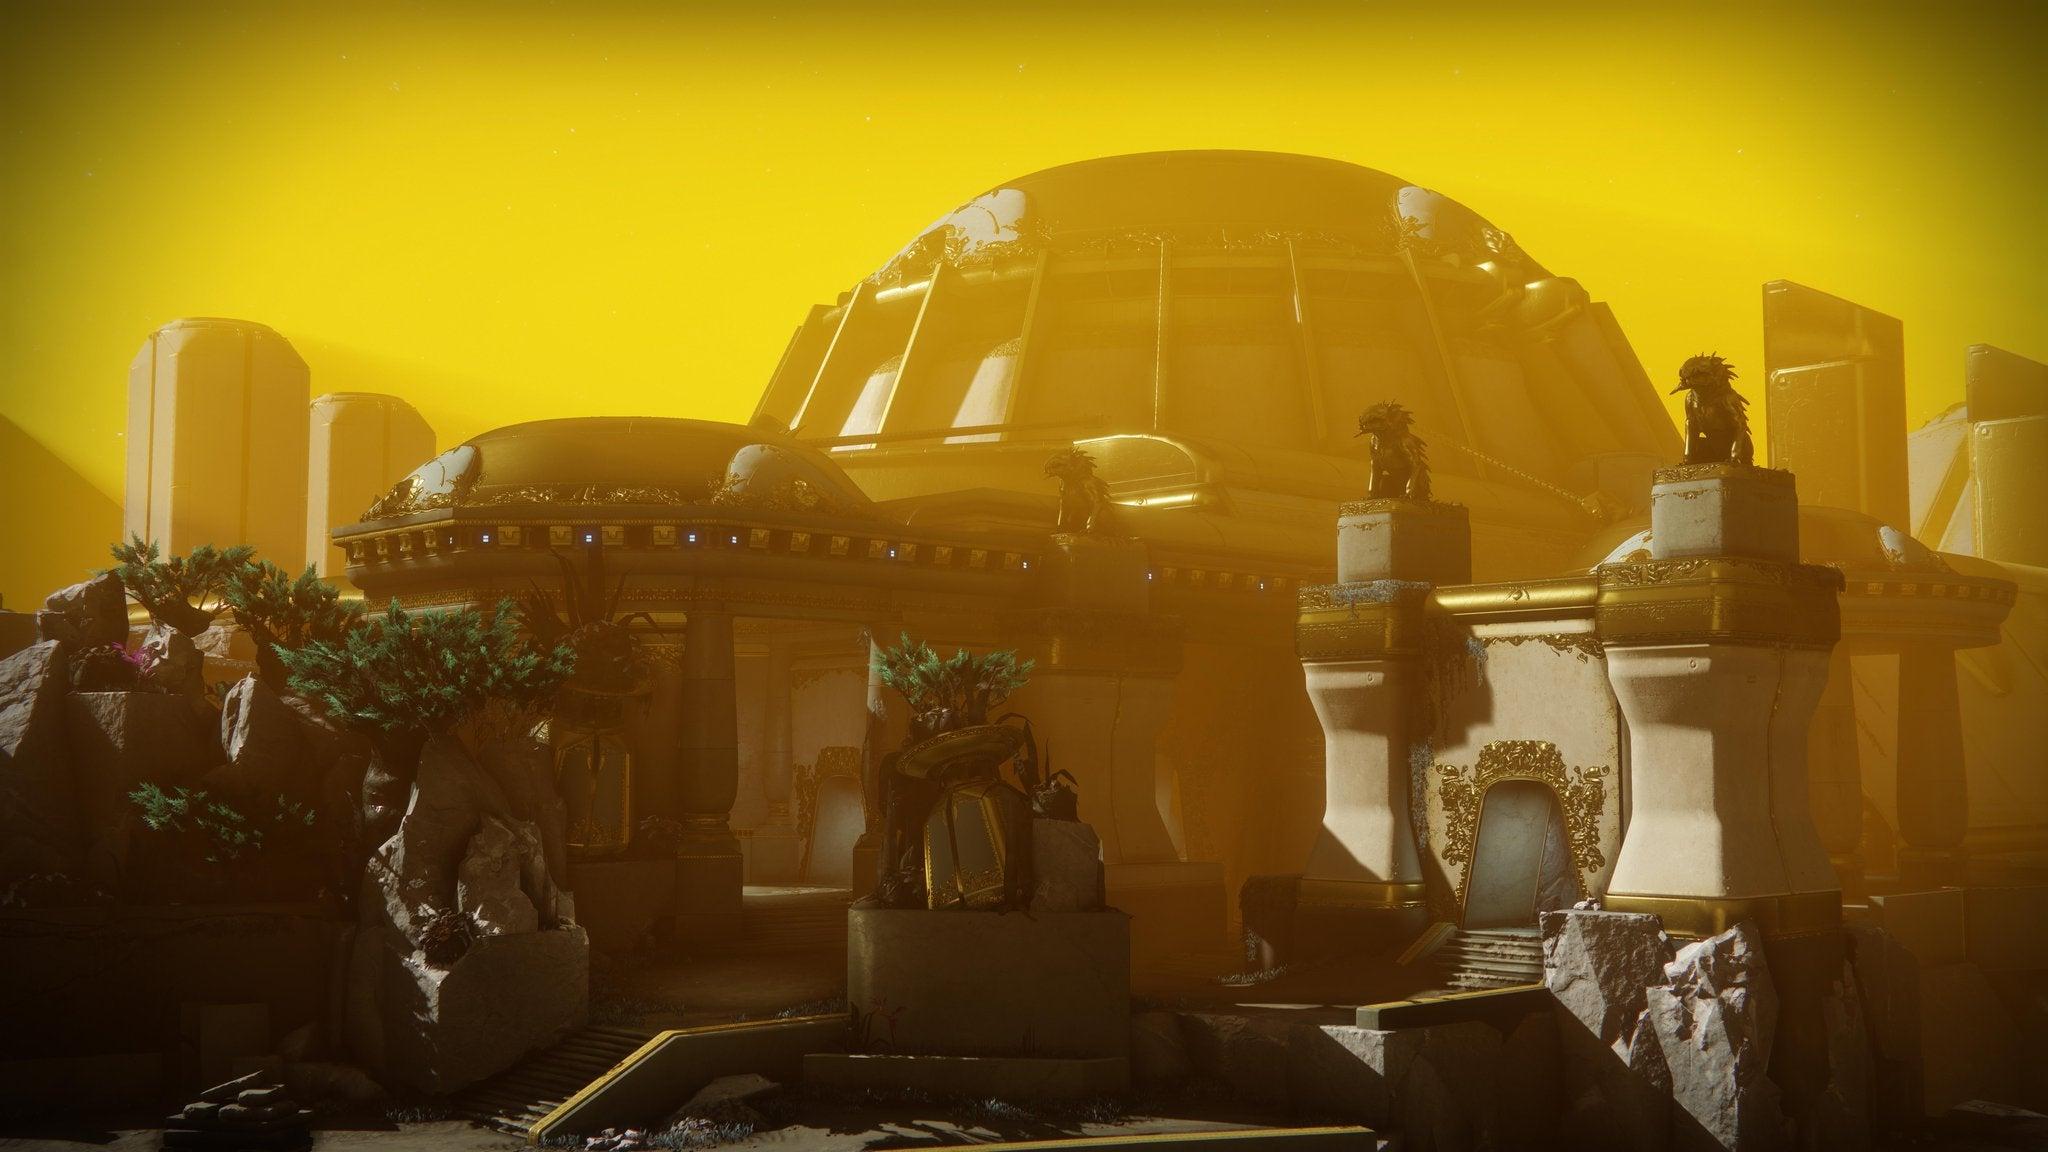 Image for Destiny 2 Leviathan raid guide: complete walkthrough, defeat Calus, secret chest locations and loot